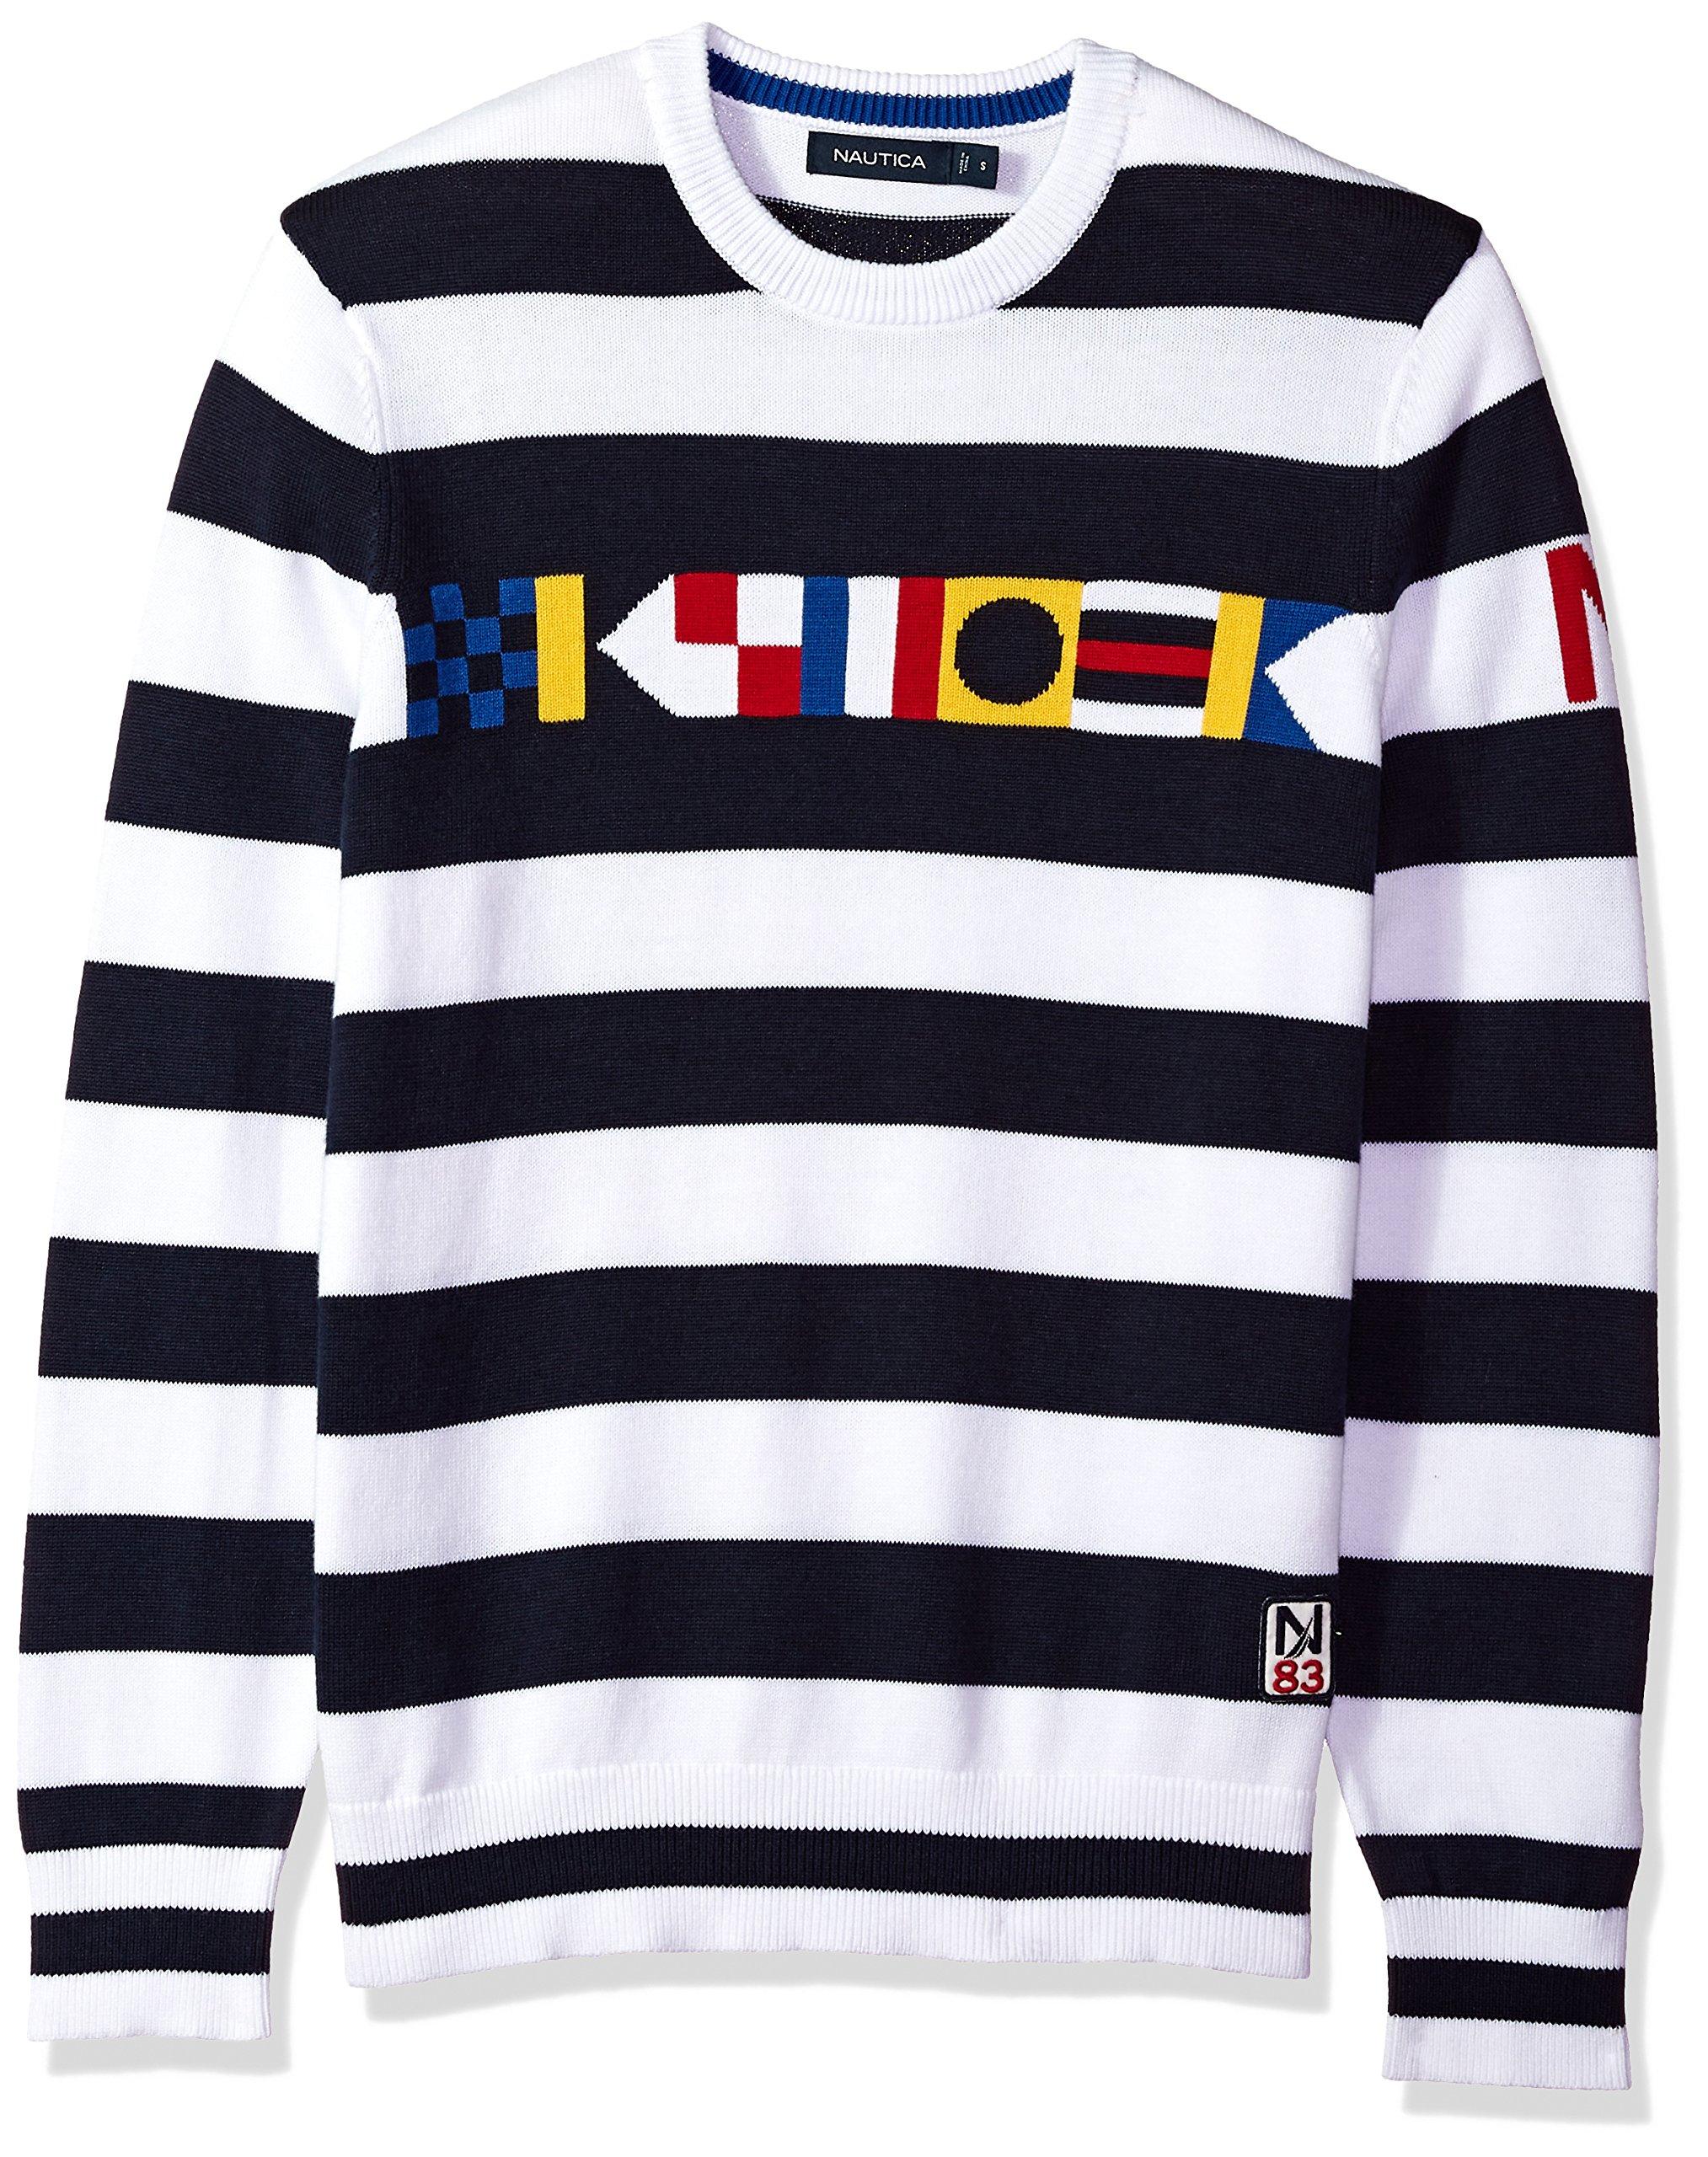 Nautica Men's Long Sleeve Signature Print Sweater, Bright White, Large